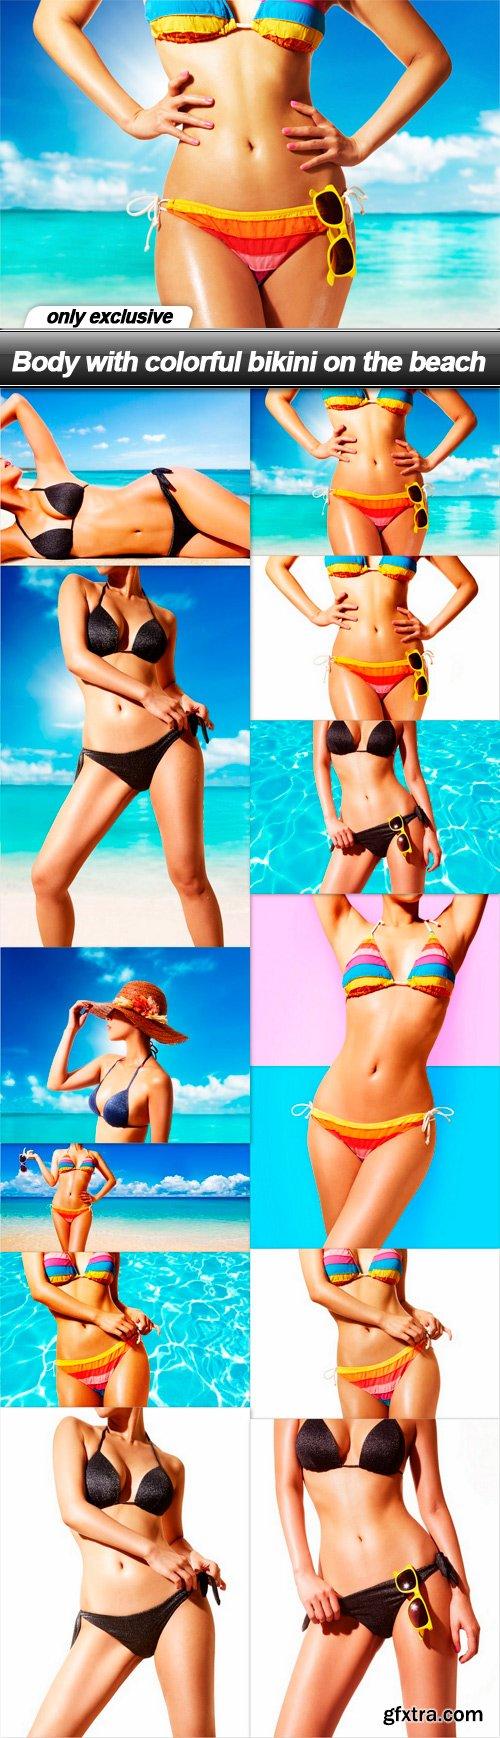 Body with colorful bikini on the beach - 12 UHQ JPEG